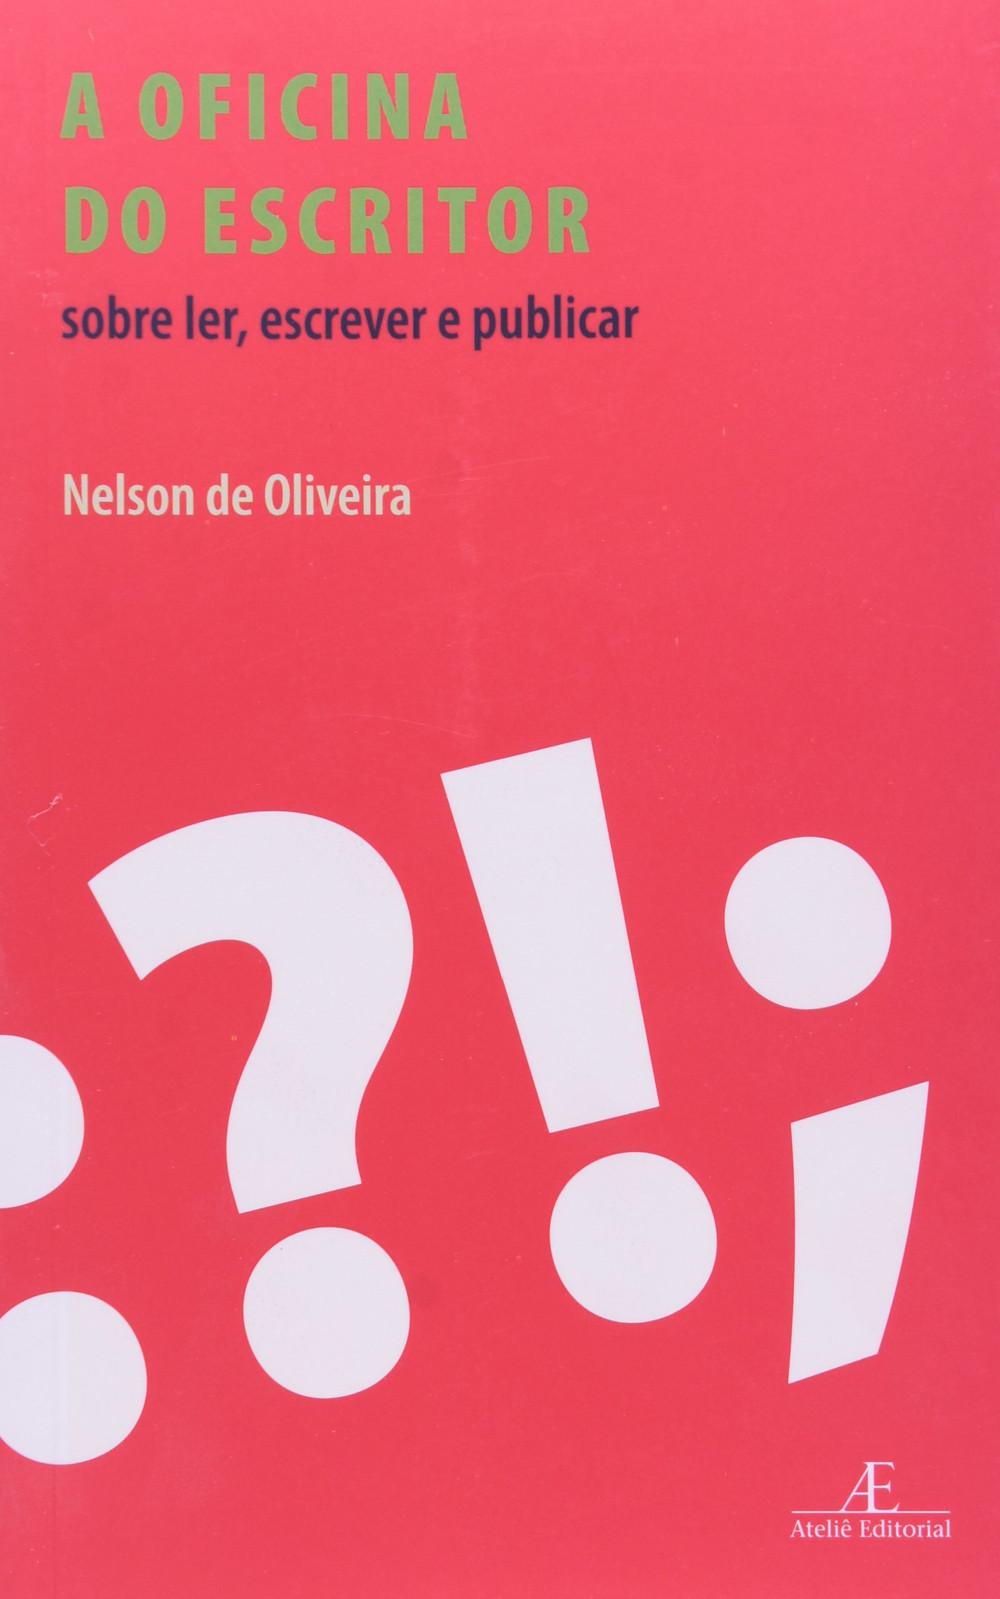 A Oficina do Escritor Sobre Ler, Escrever e Publicar de Nelson de Oliveira